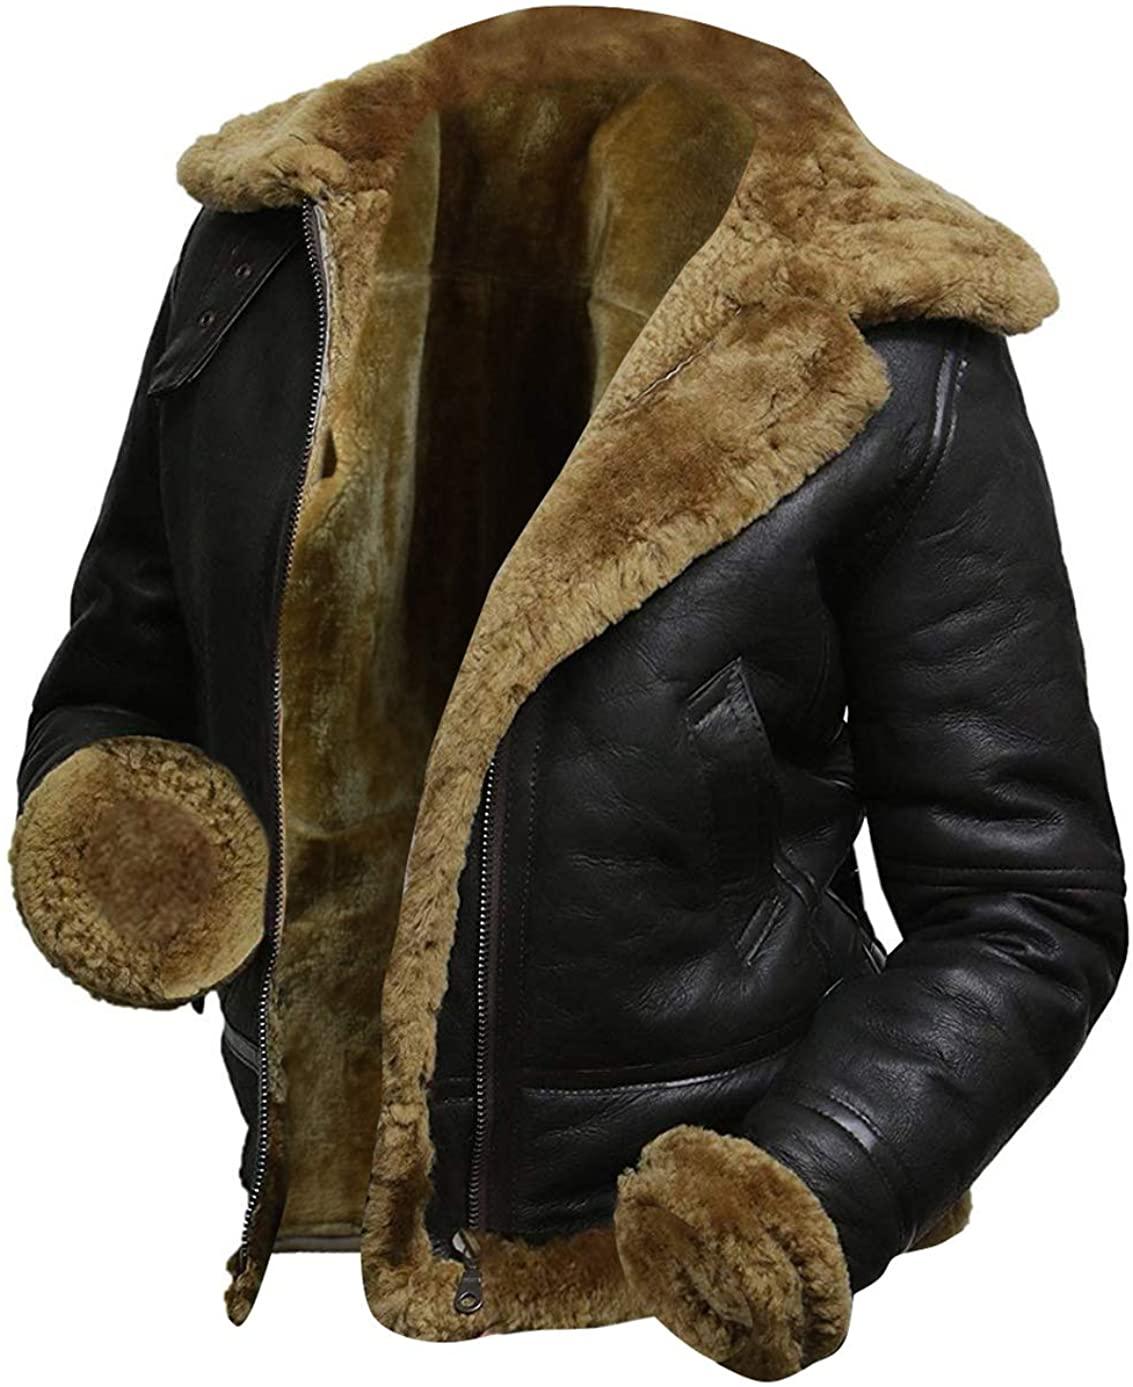 III-Fashions B3 Fur Womens Genuine Leather Aviator Flight Sheepskin Shearling Bomber Jacket